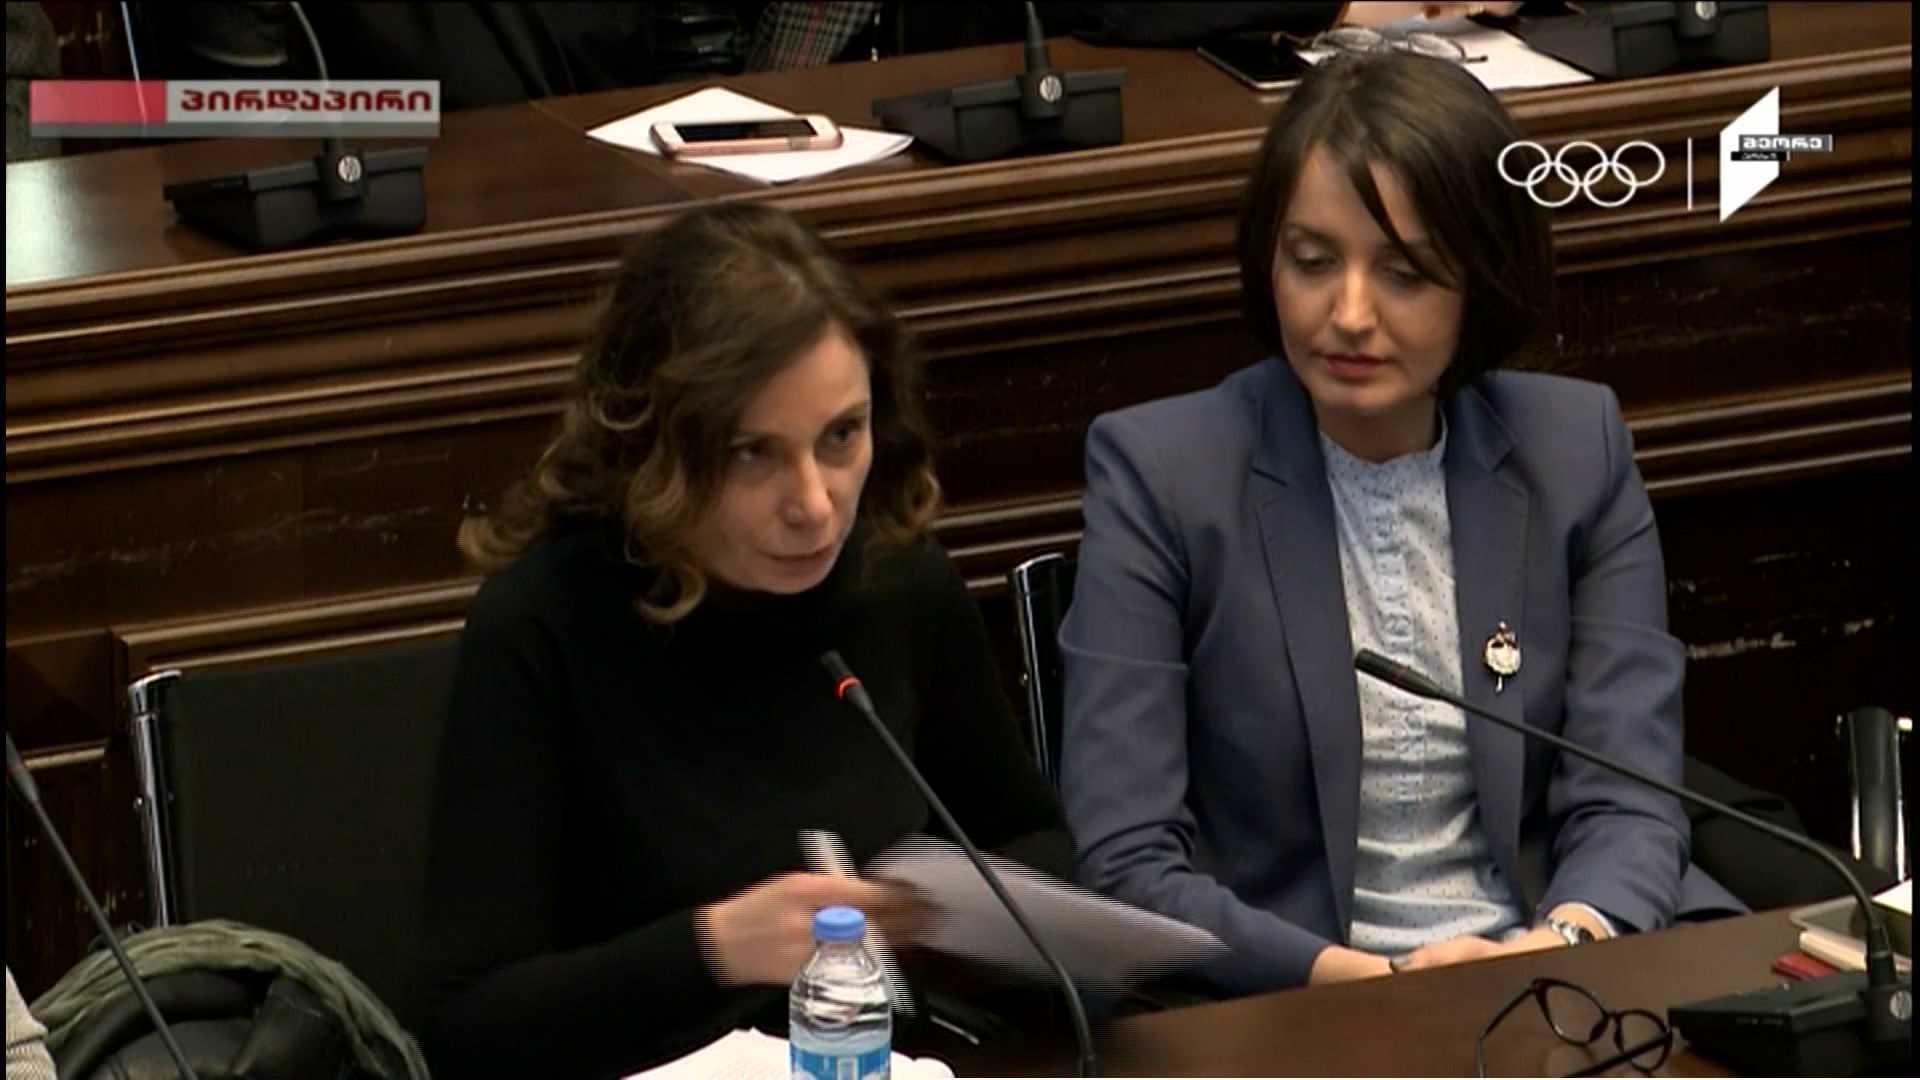 Noise at the meeting of Irakli Kobakhidze and media organization representatives